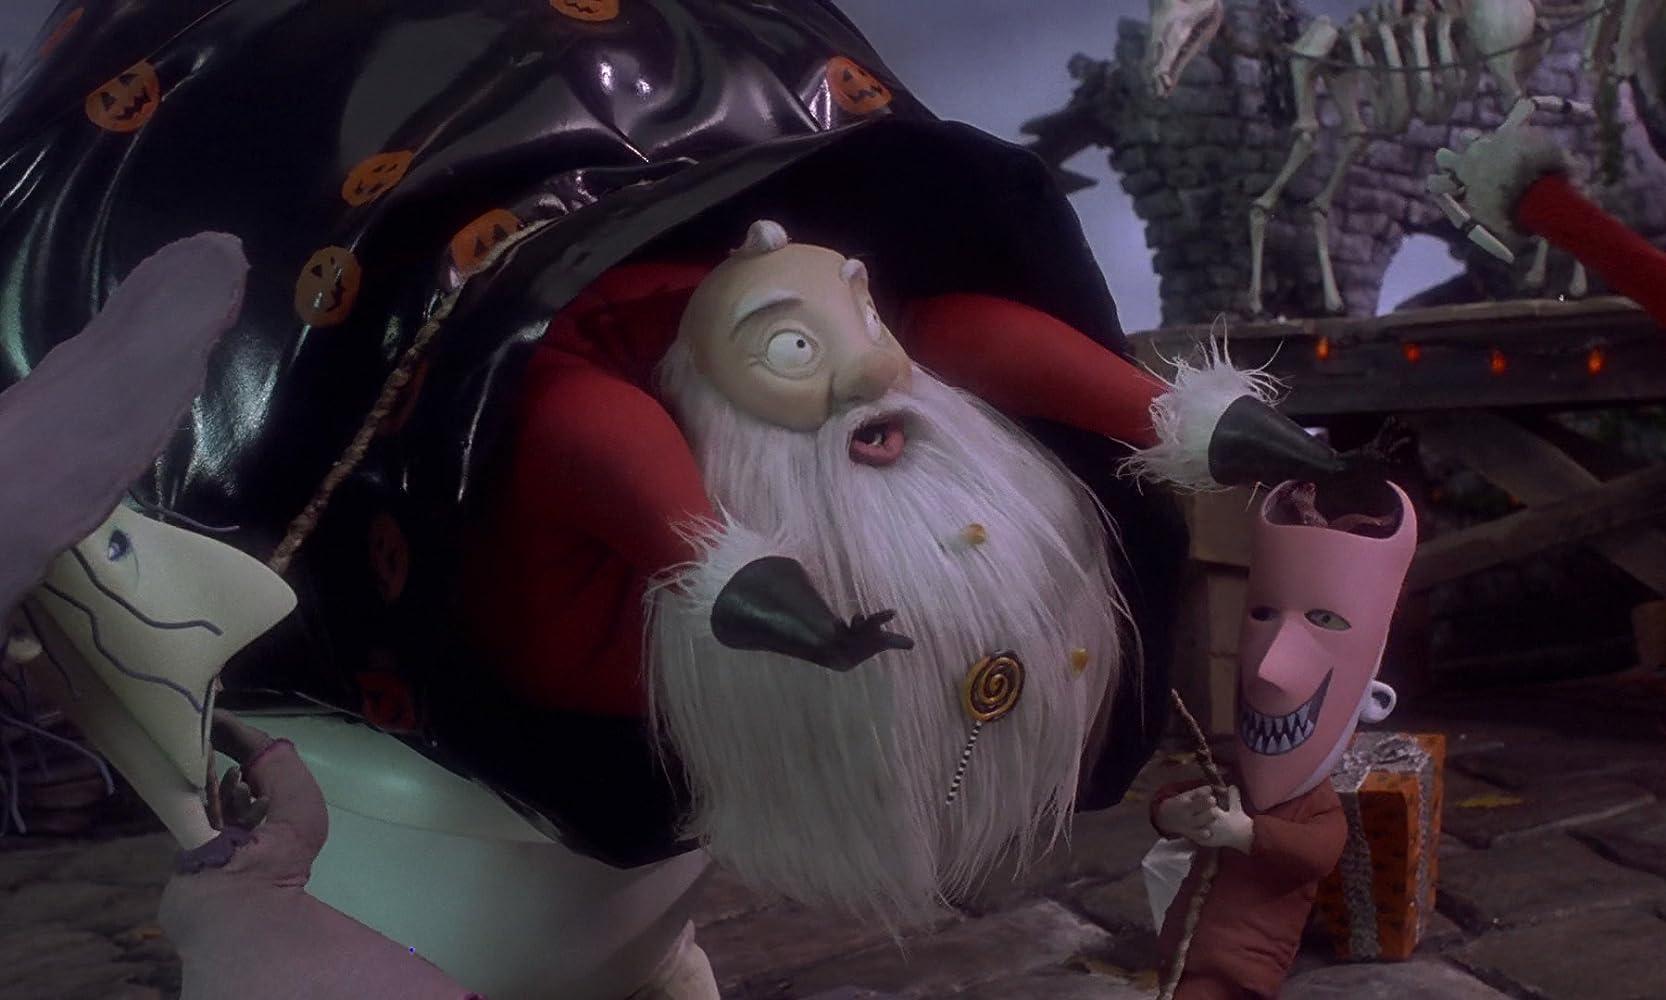 Vote Your Favorite Santa Claus